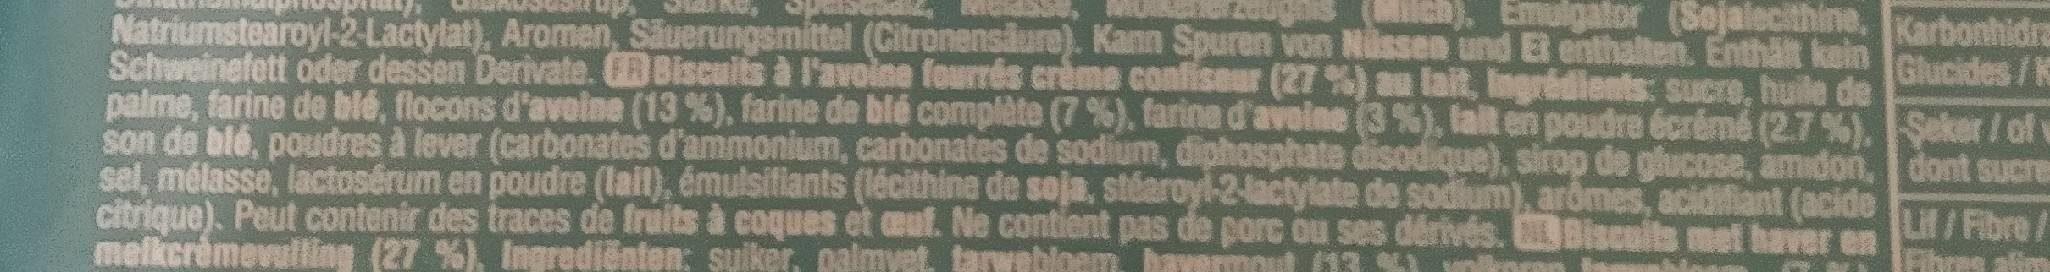 Sakliköy - Ingrédients - fr